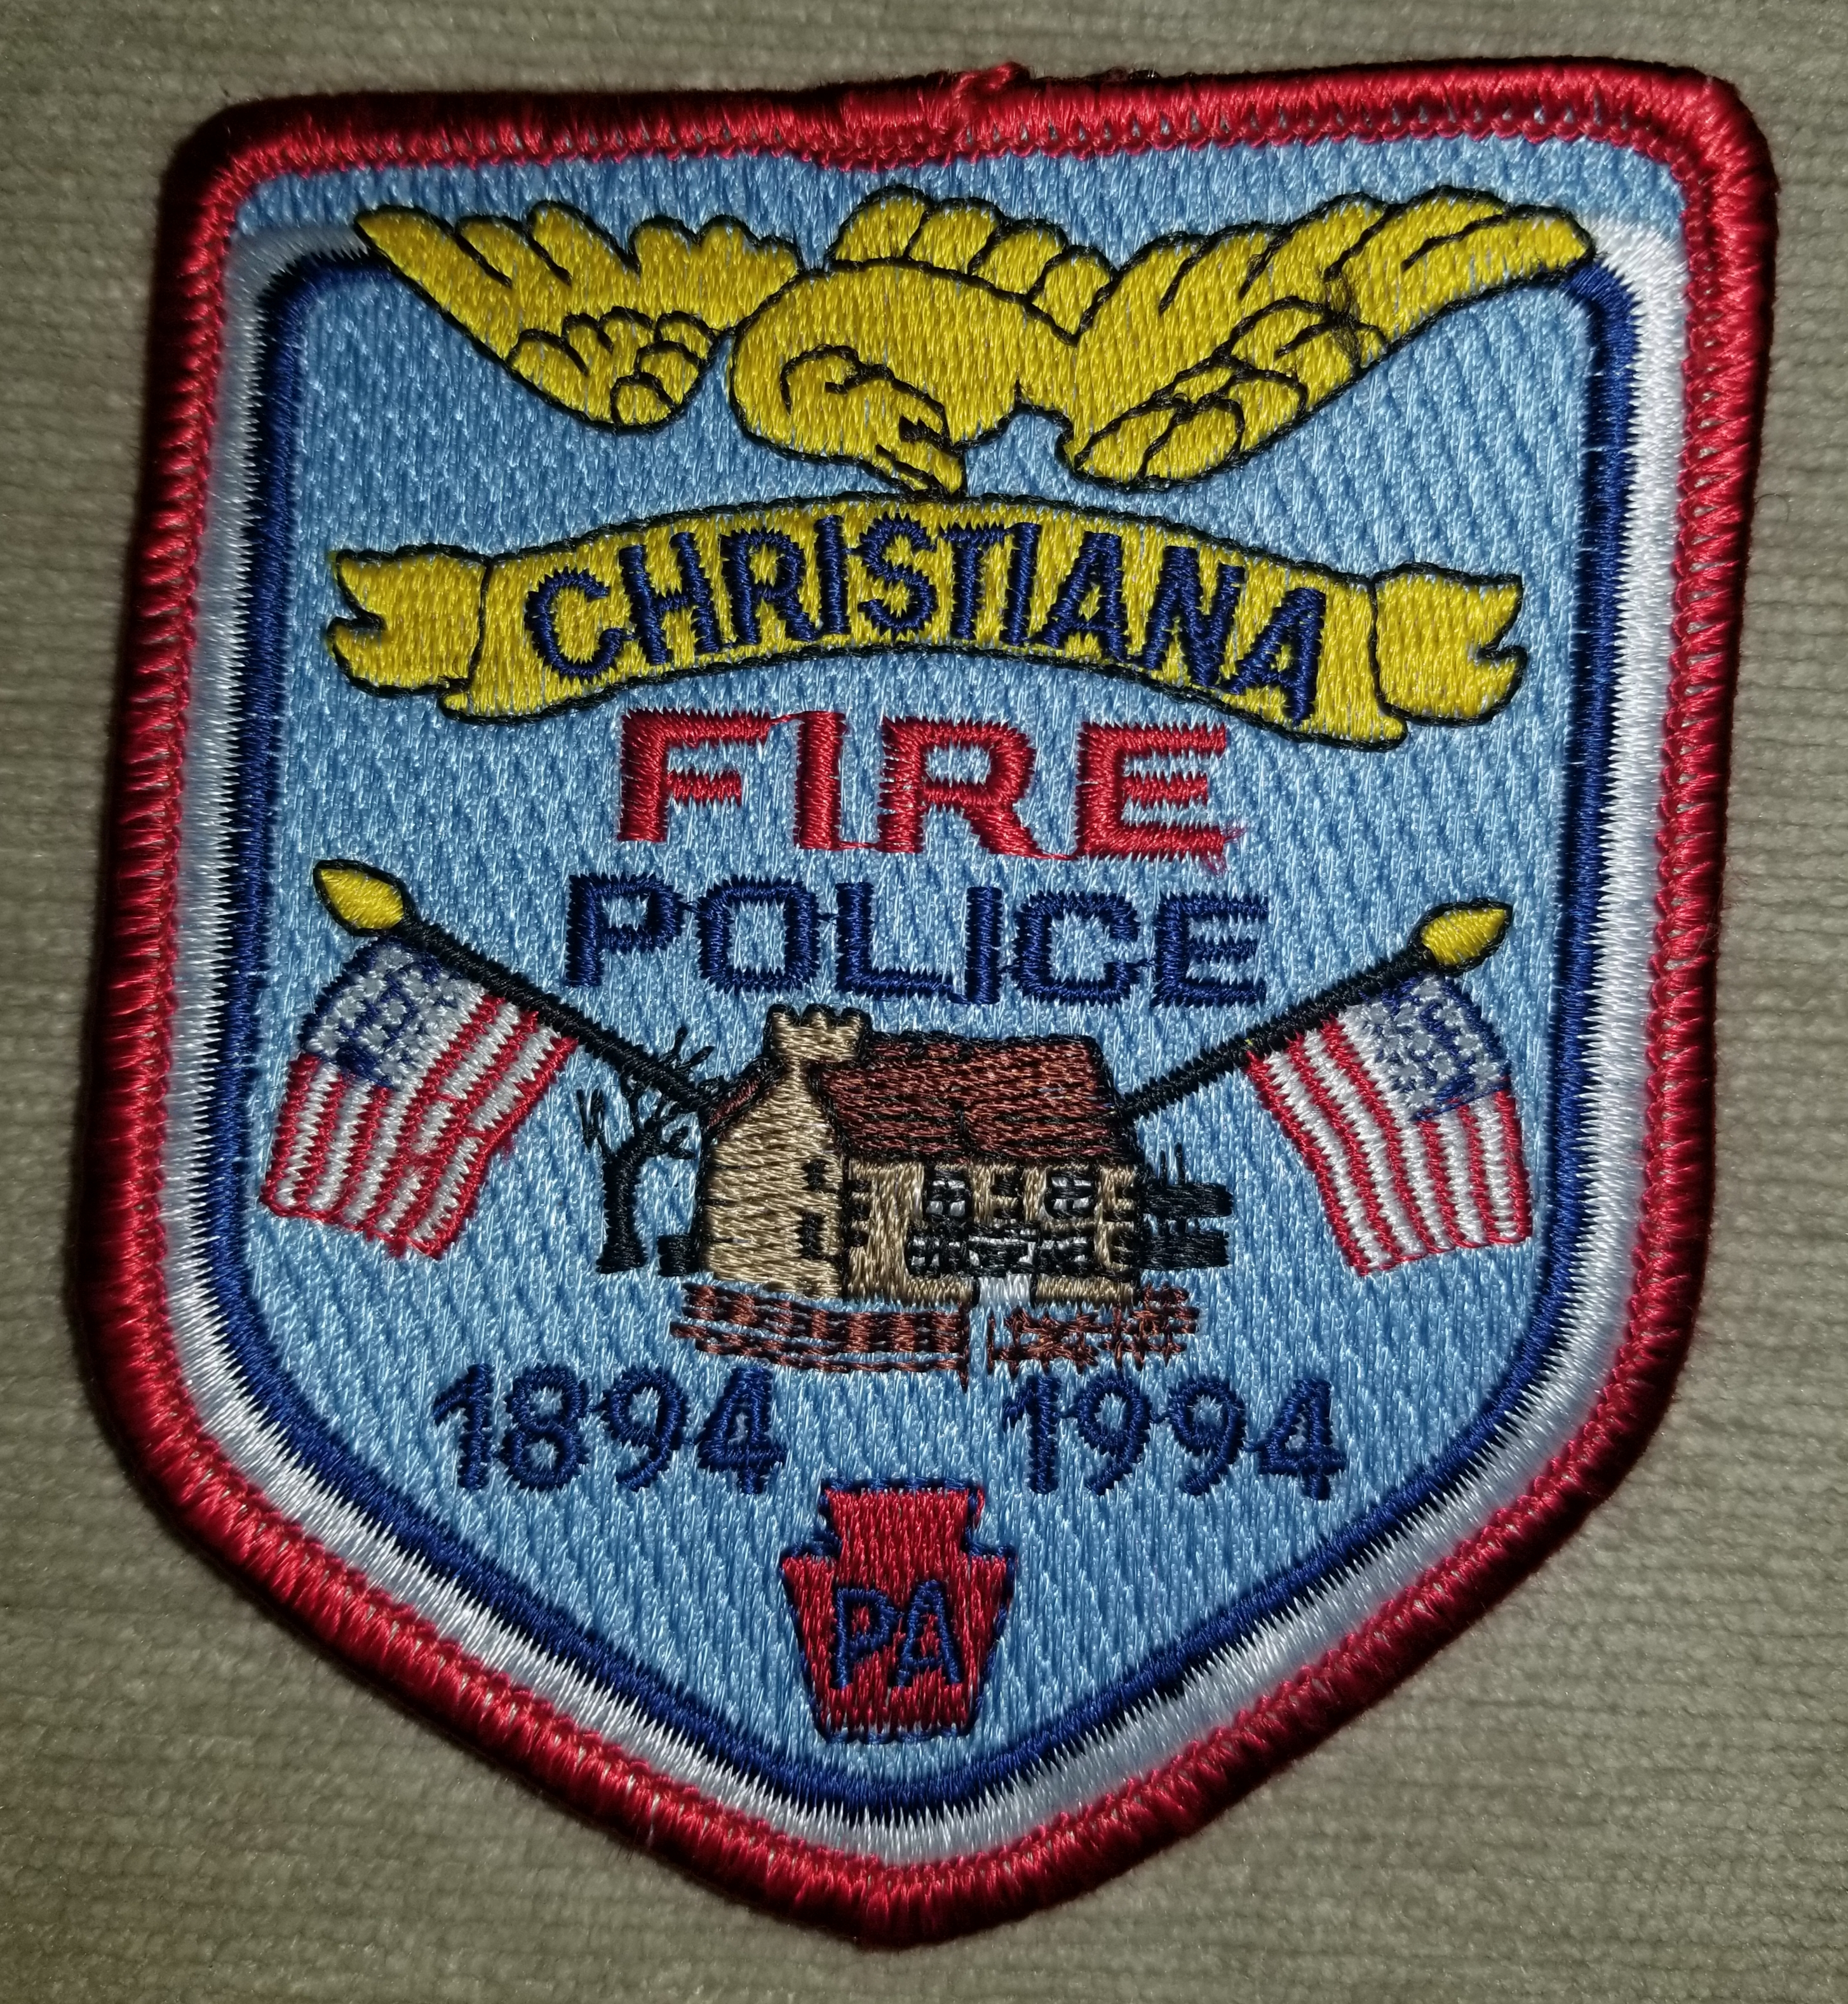 Christiana Fire Police PA